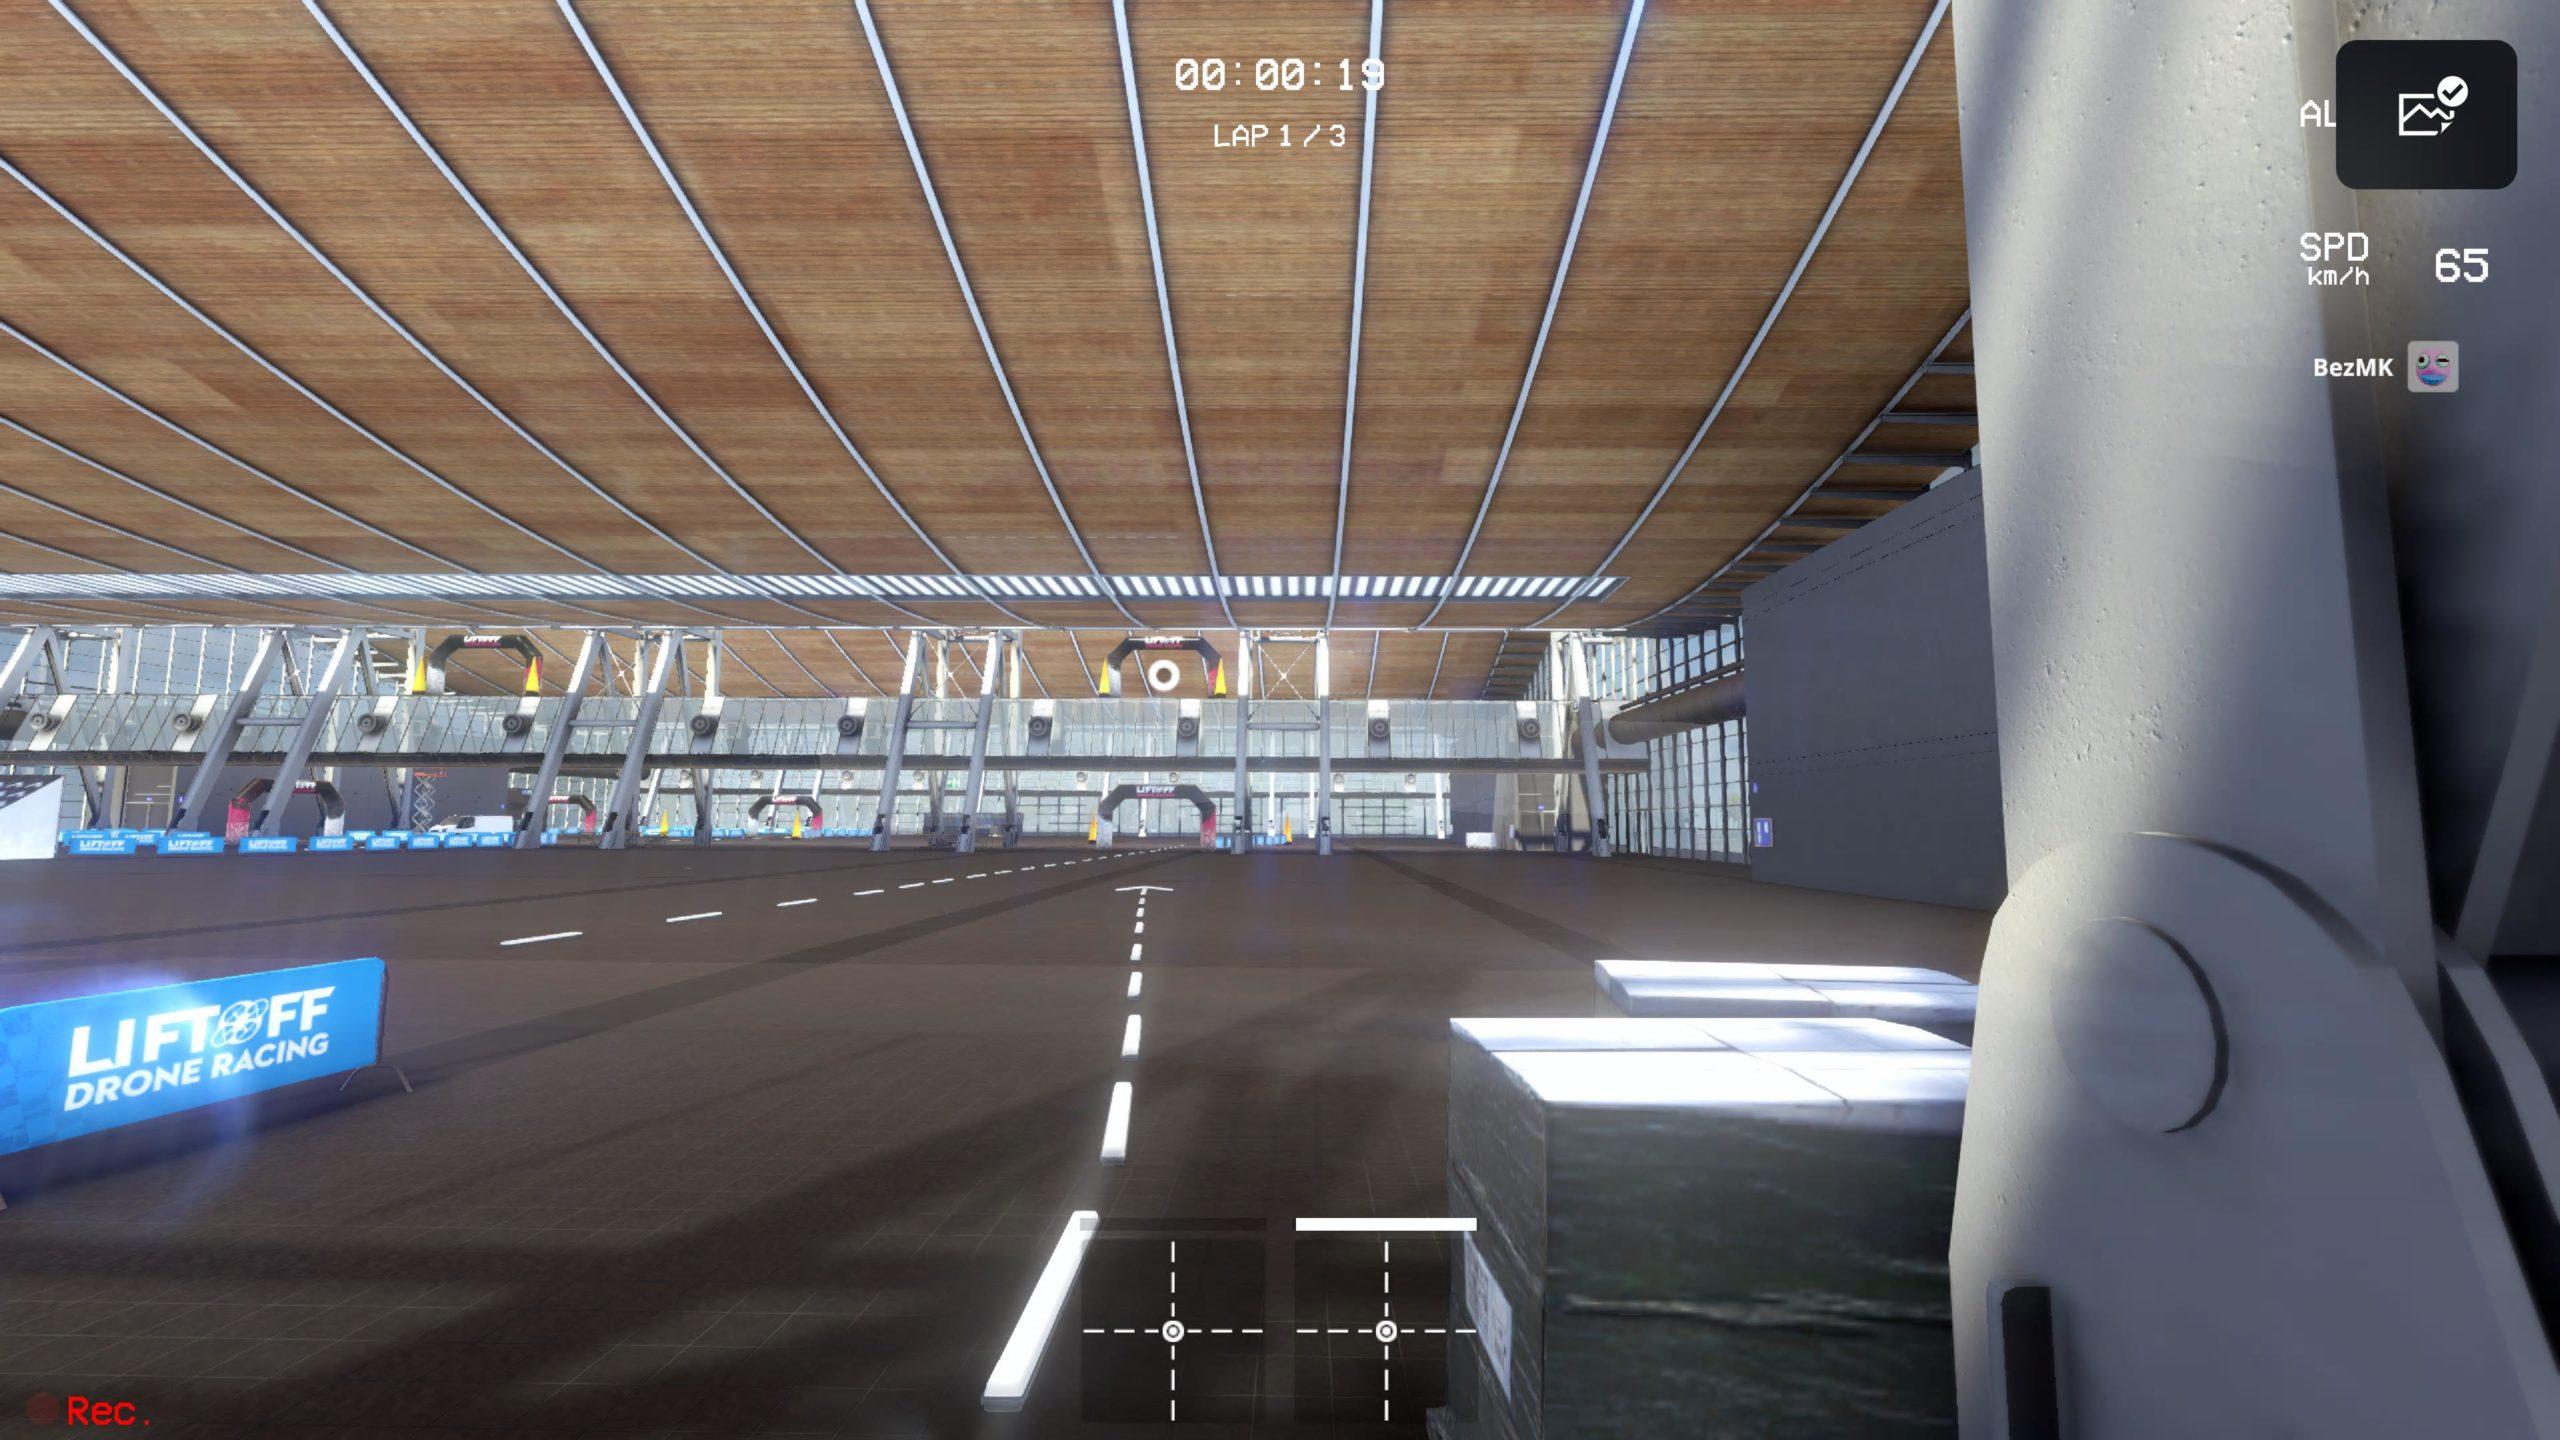 Liftoff_ Drone Racing_20201202014650